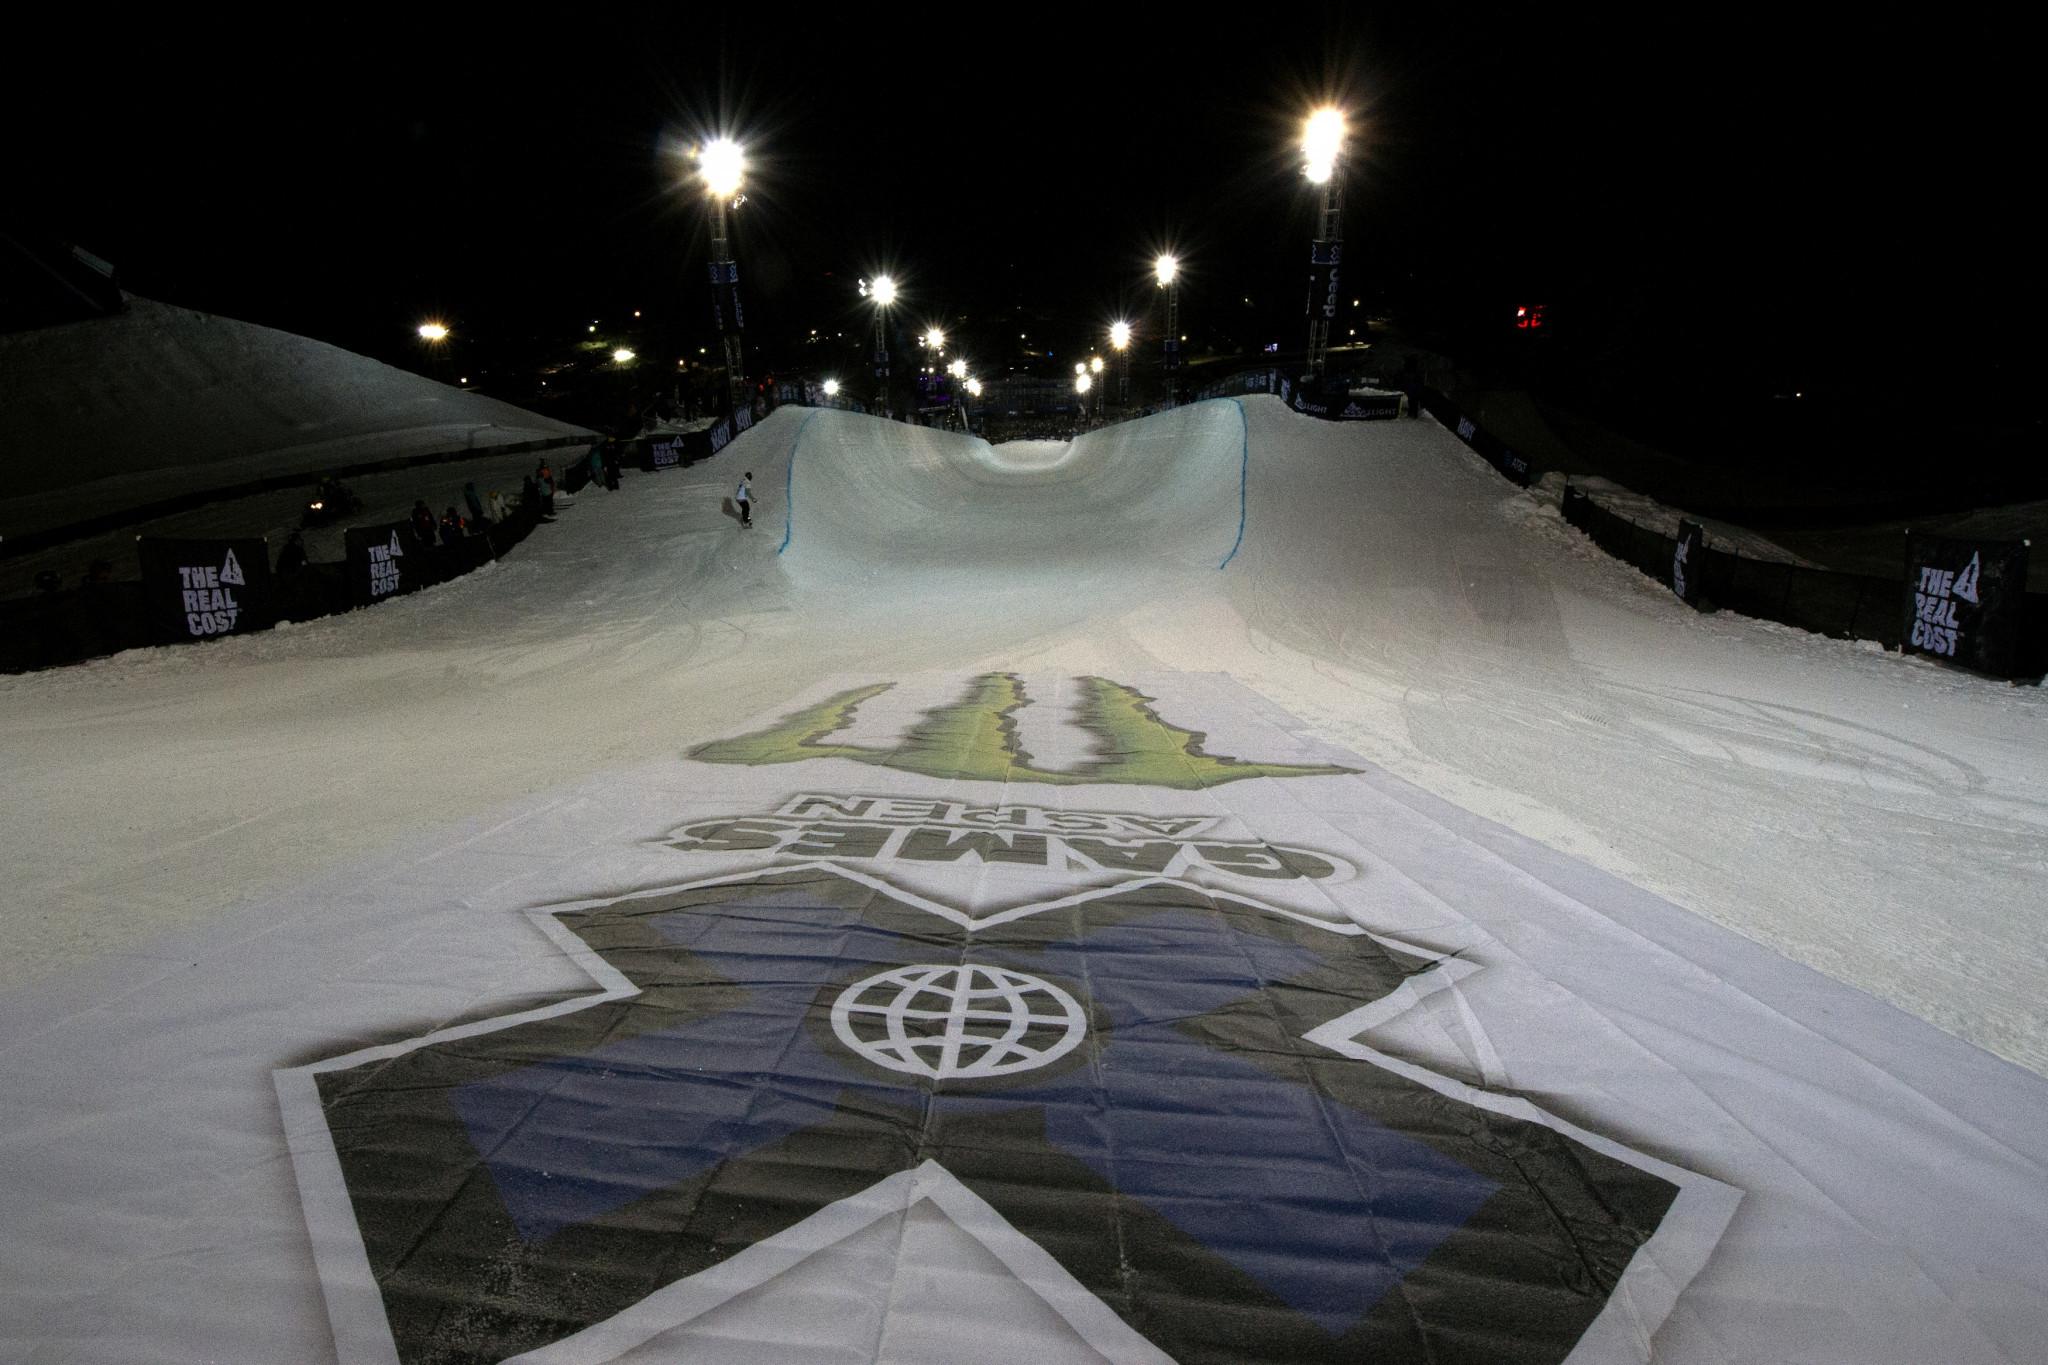 Winter X Games XXIV extravaganza all set for Aspen